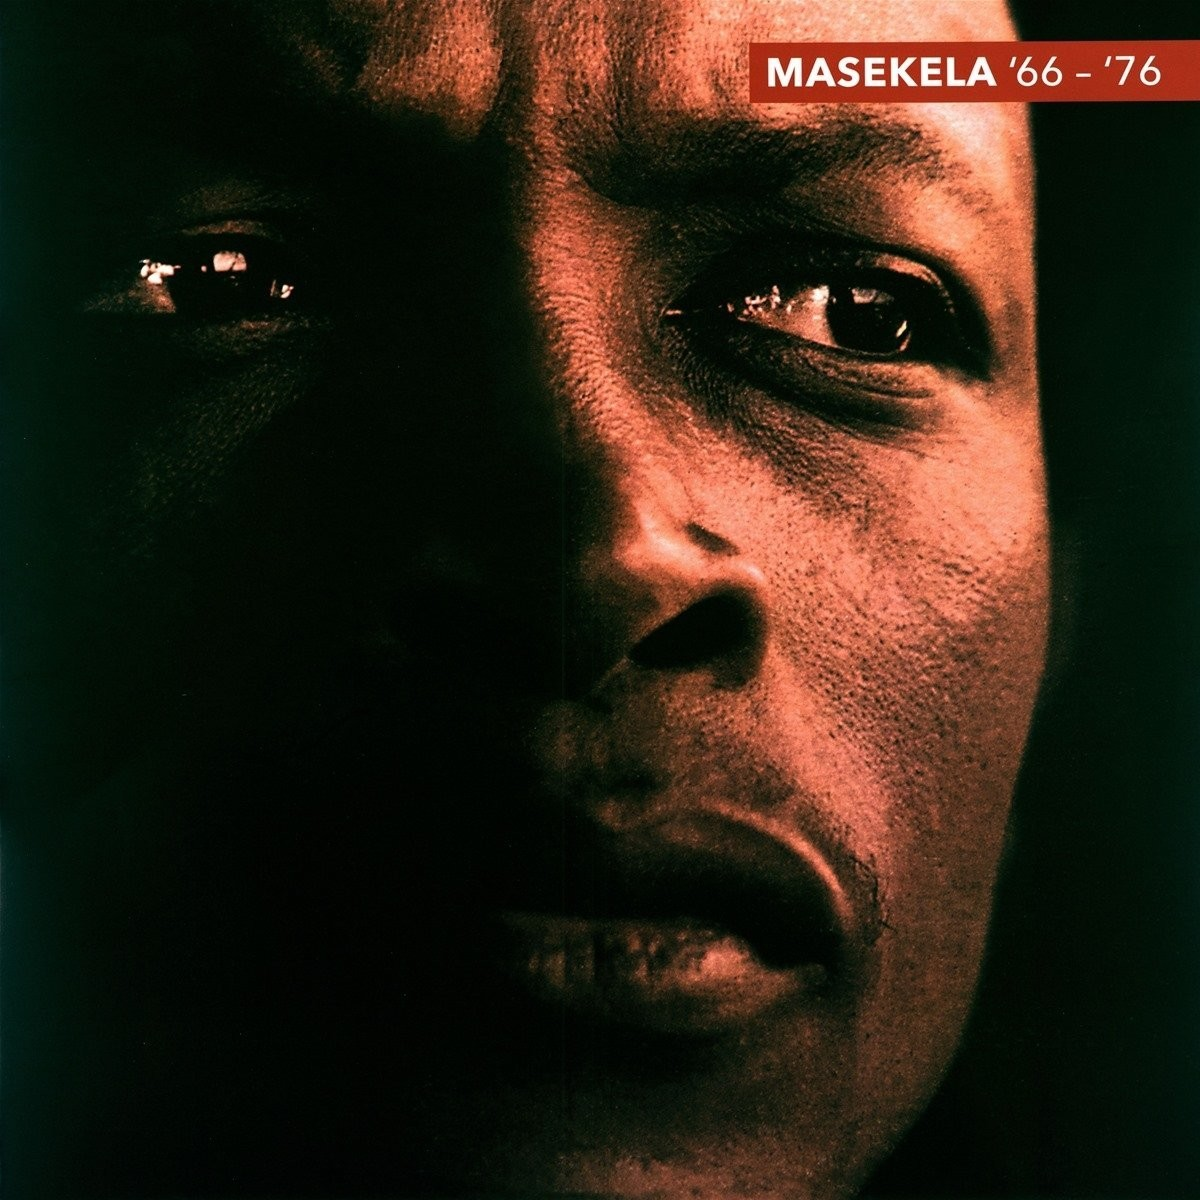 Masekela '66-'76